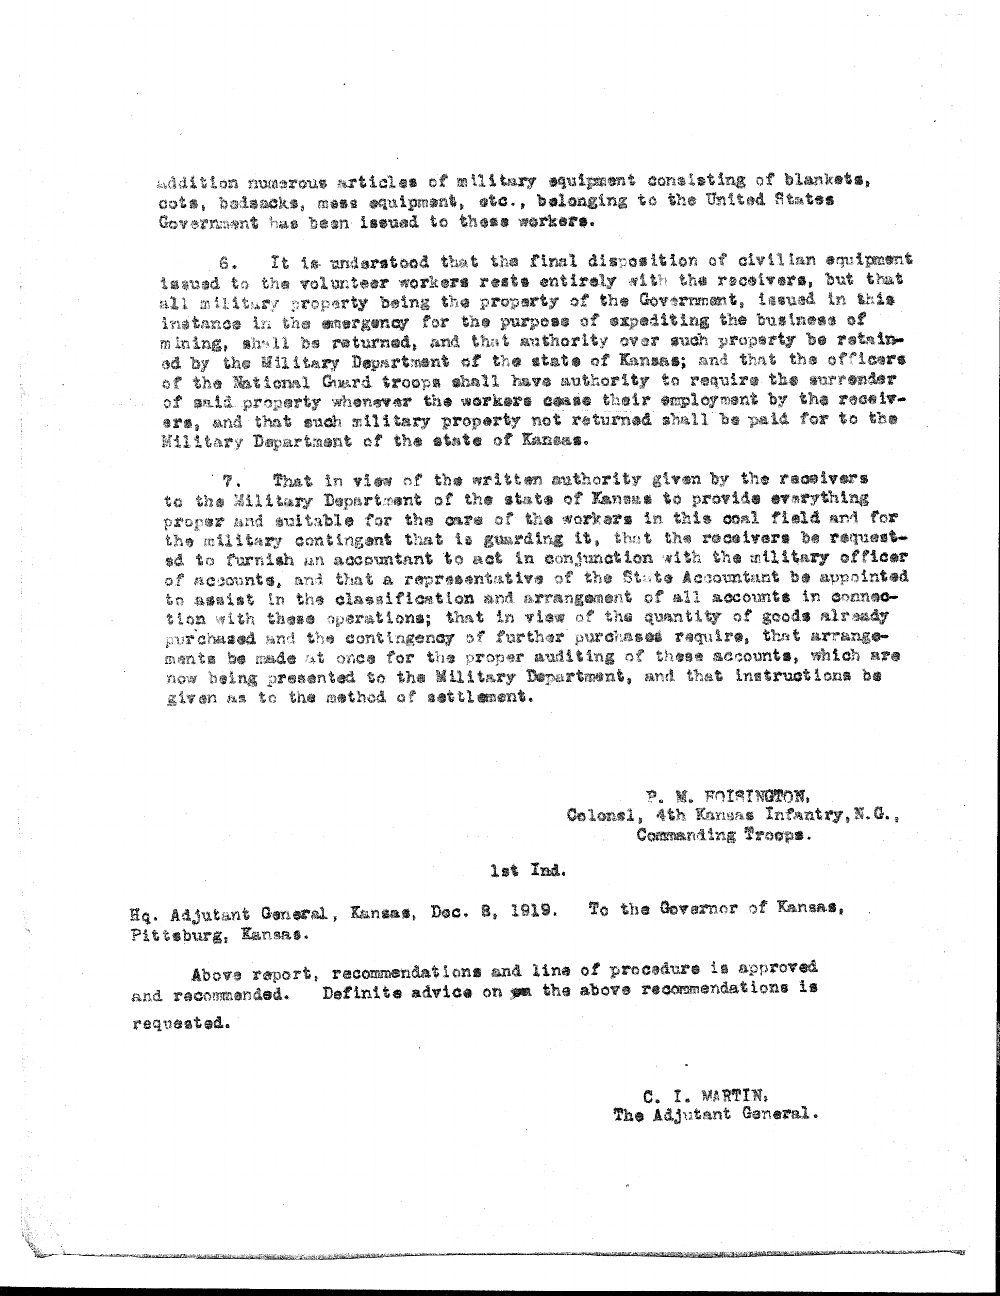 Colonel P. M. Hoisington to the Adjutant General of Kansas - 2